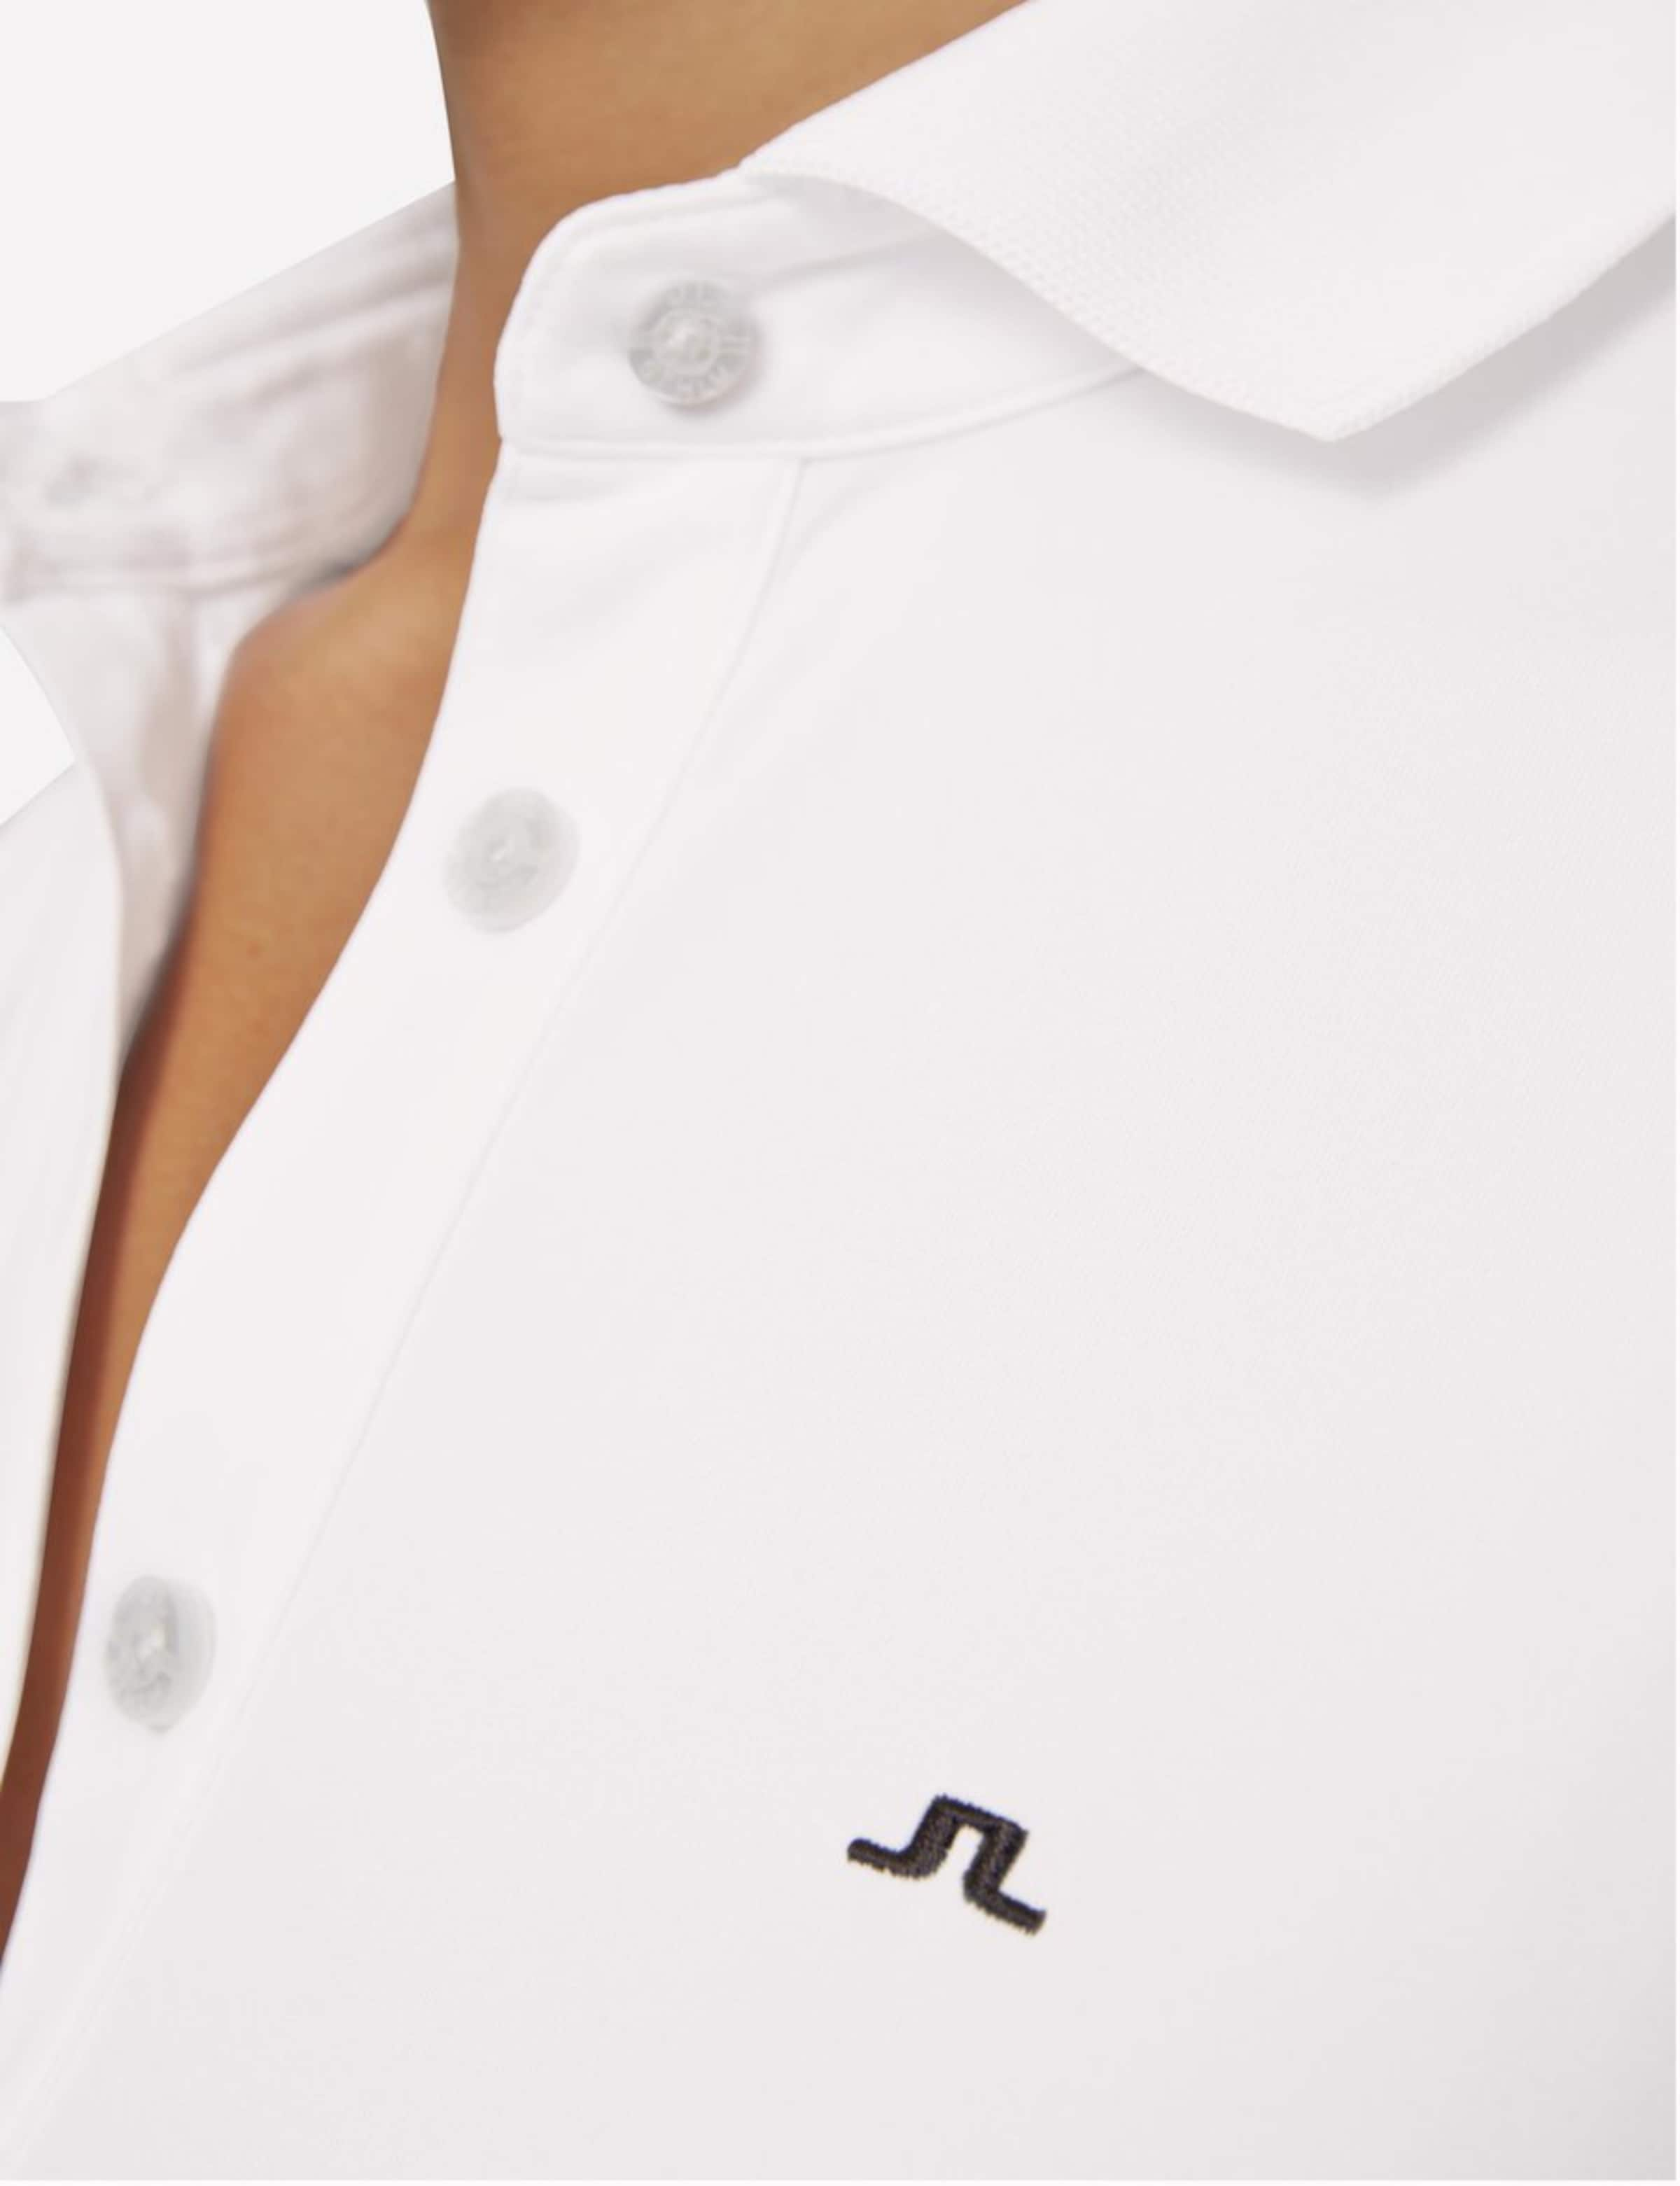 J.Lindeberg Kleid 'Louise TX Jersey' Rabatt Authentische Online Bestpreis Sneakernews Zum Verkauf Visa-Zahlung Zum Verkauf Online-Verkauf Ffb8xO